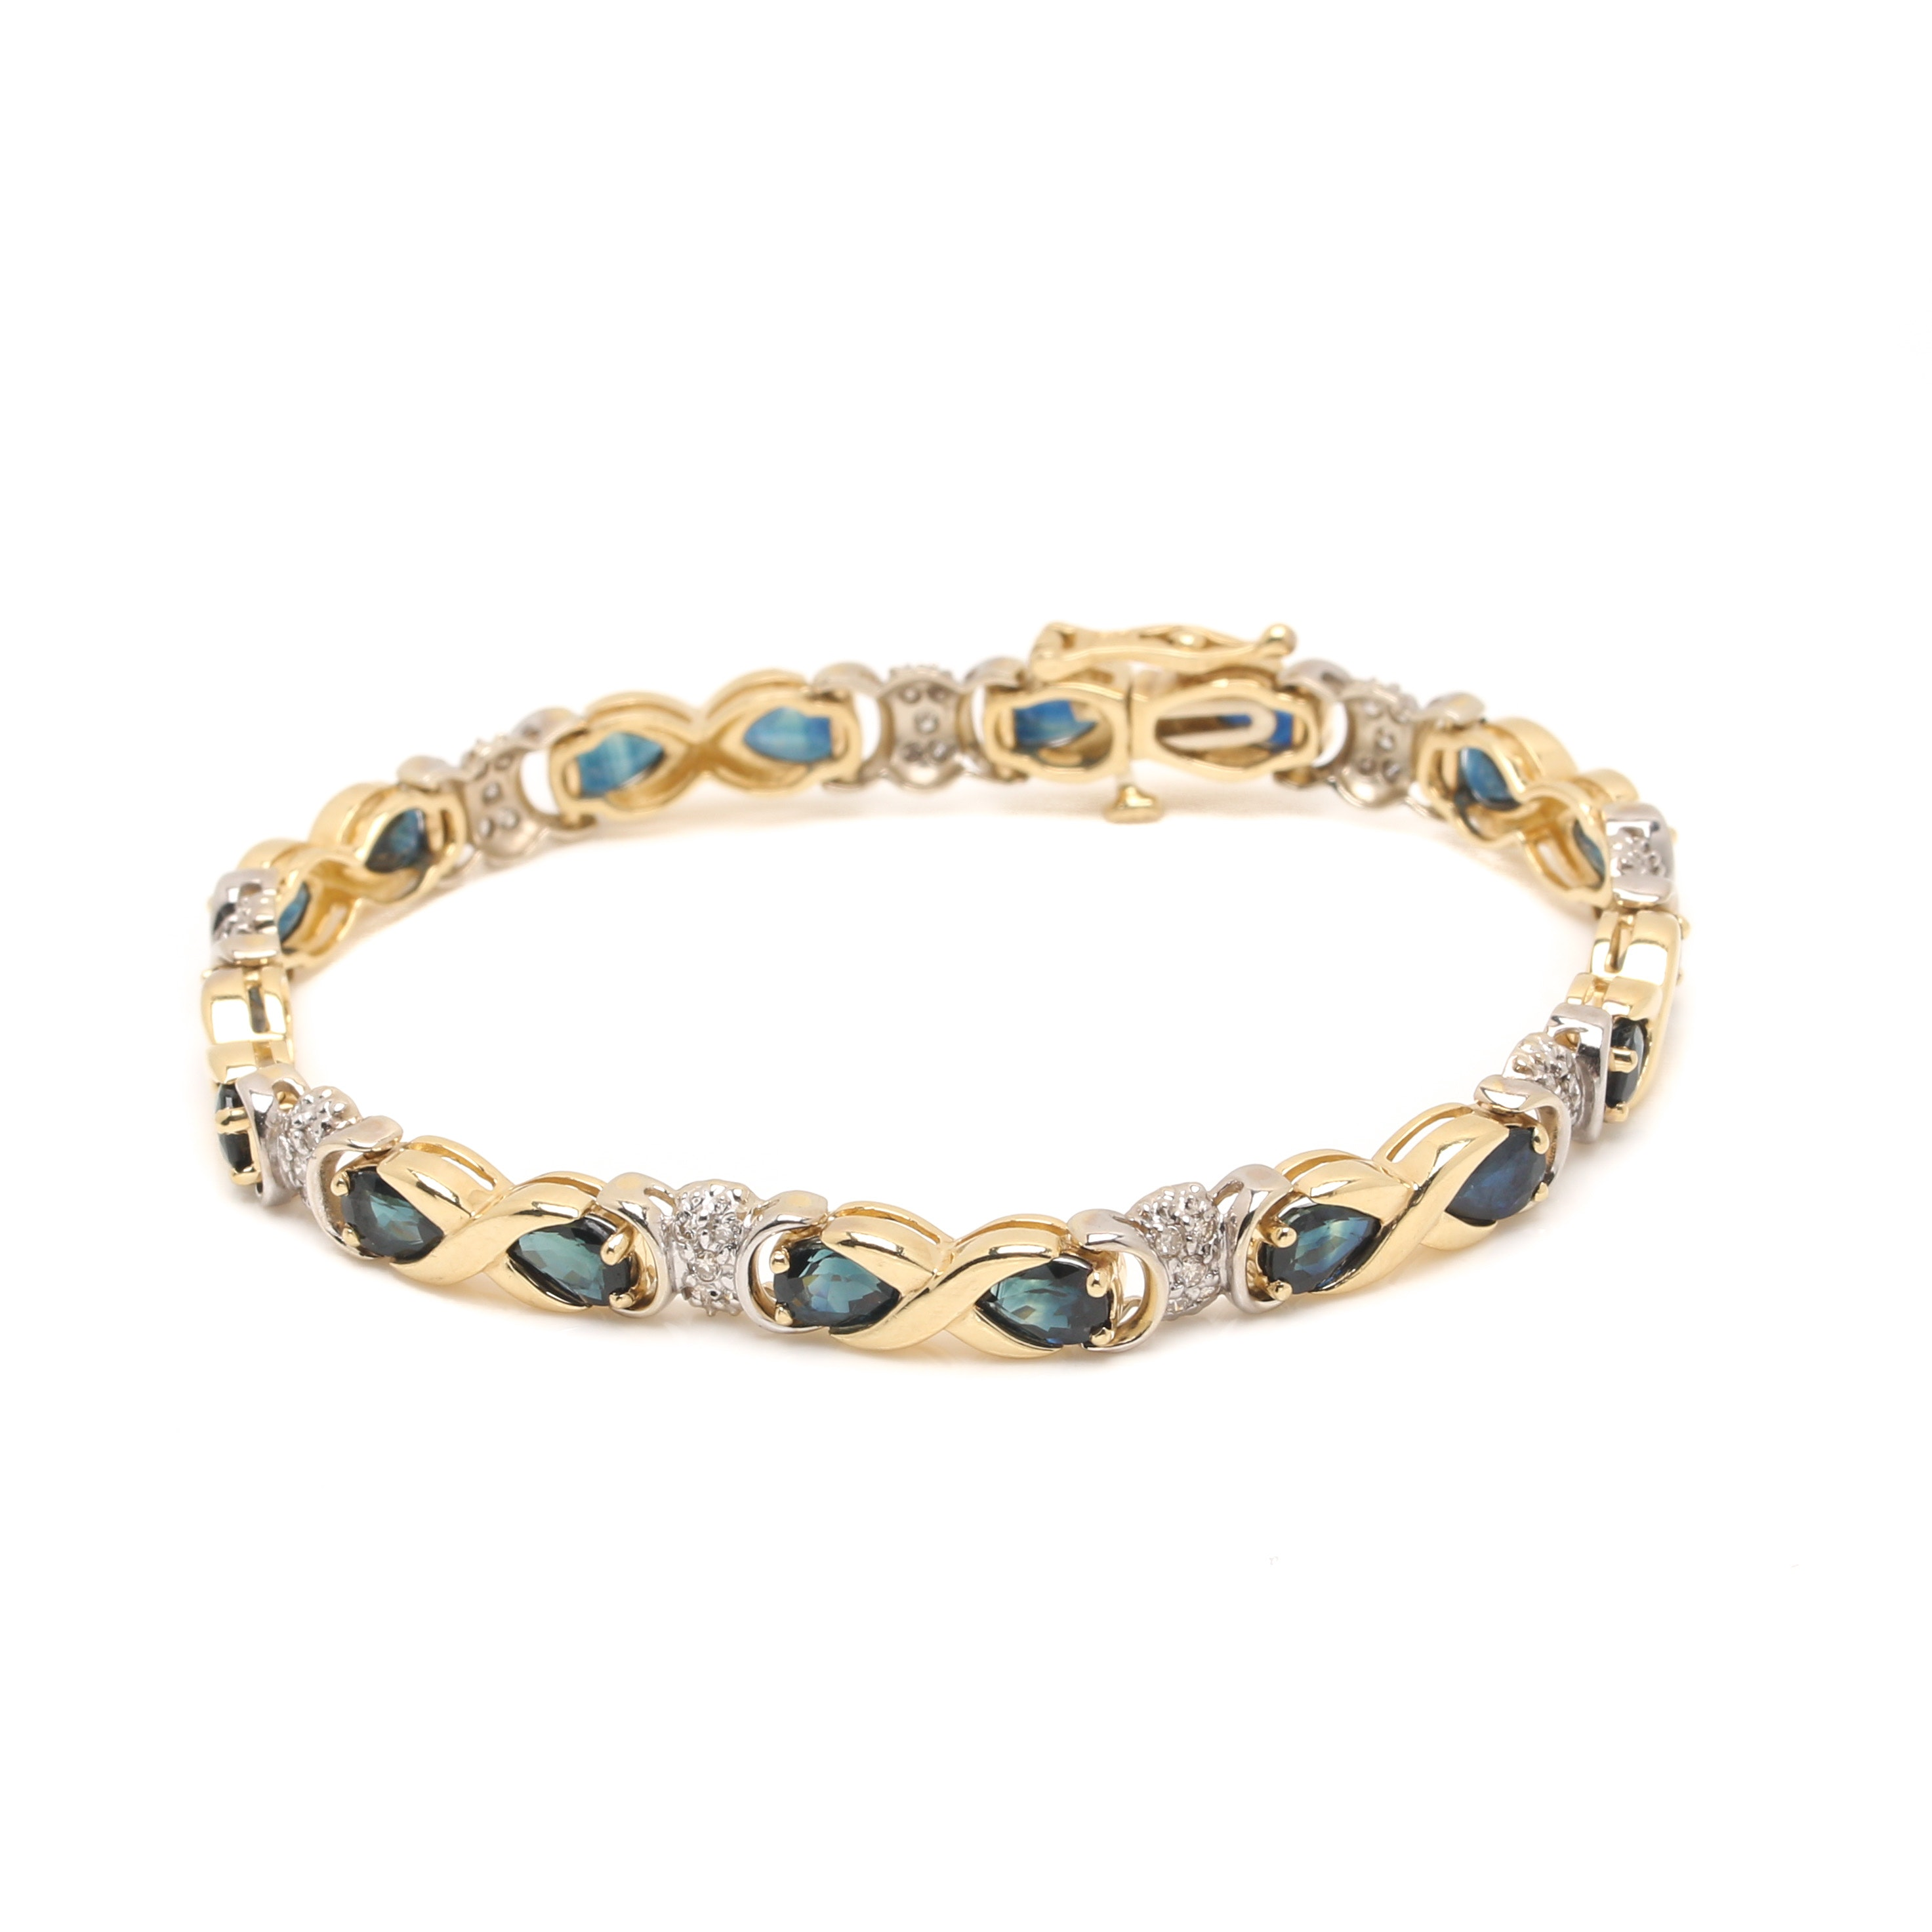 14K Two Tone Gold Sapphire and Diamond Tennis Bracelet